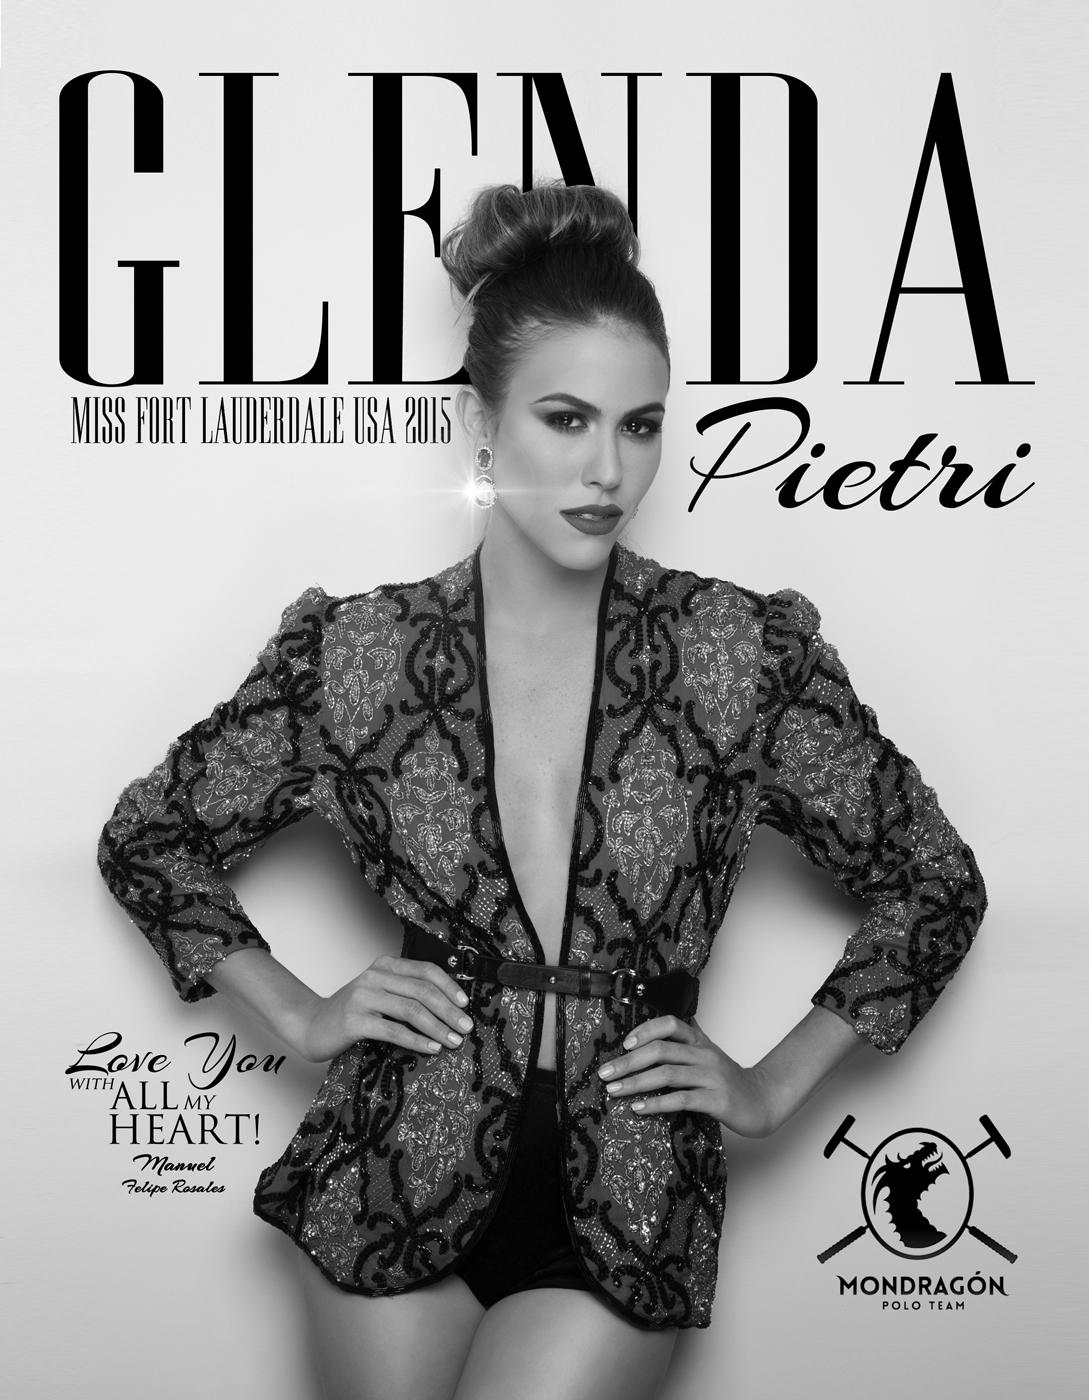 GLENDA PIETRI / MISS FT. LAUDERDALE